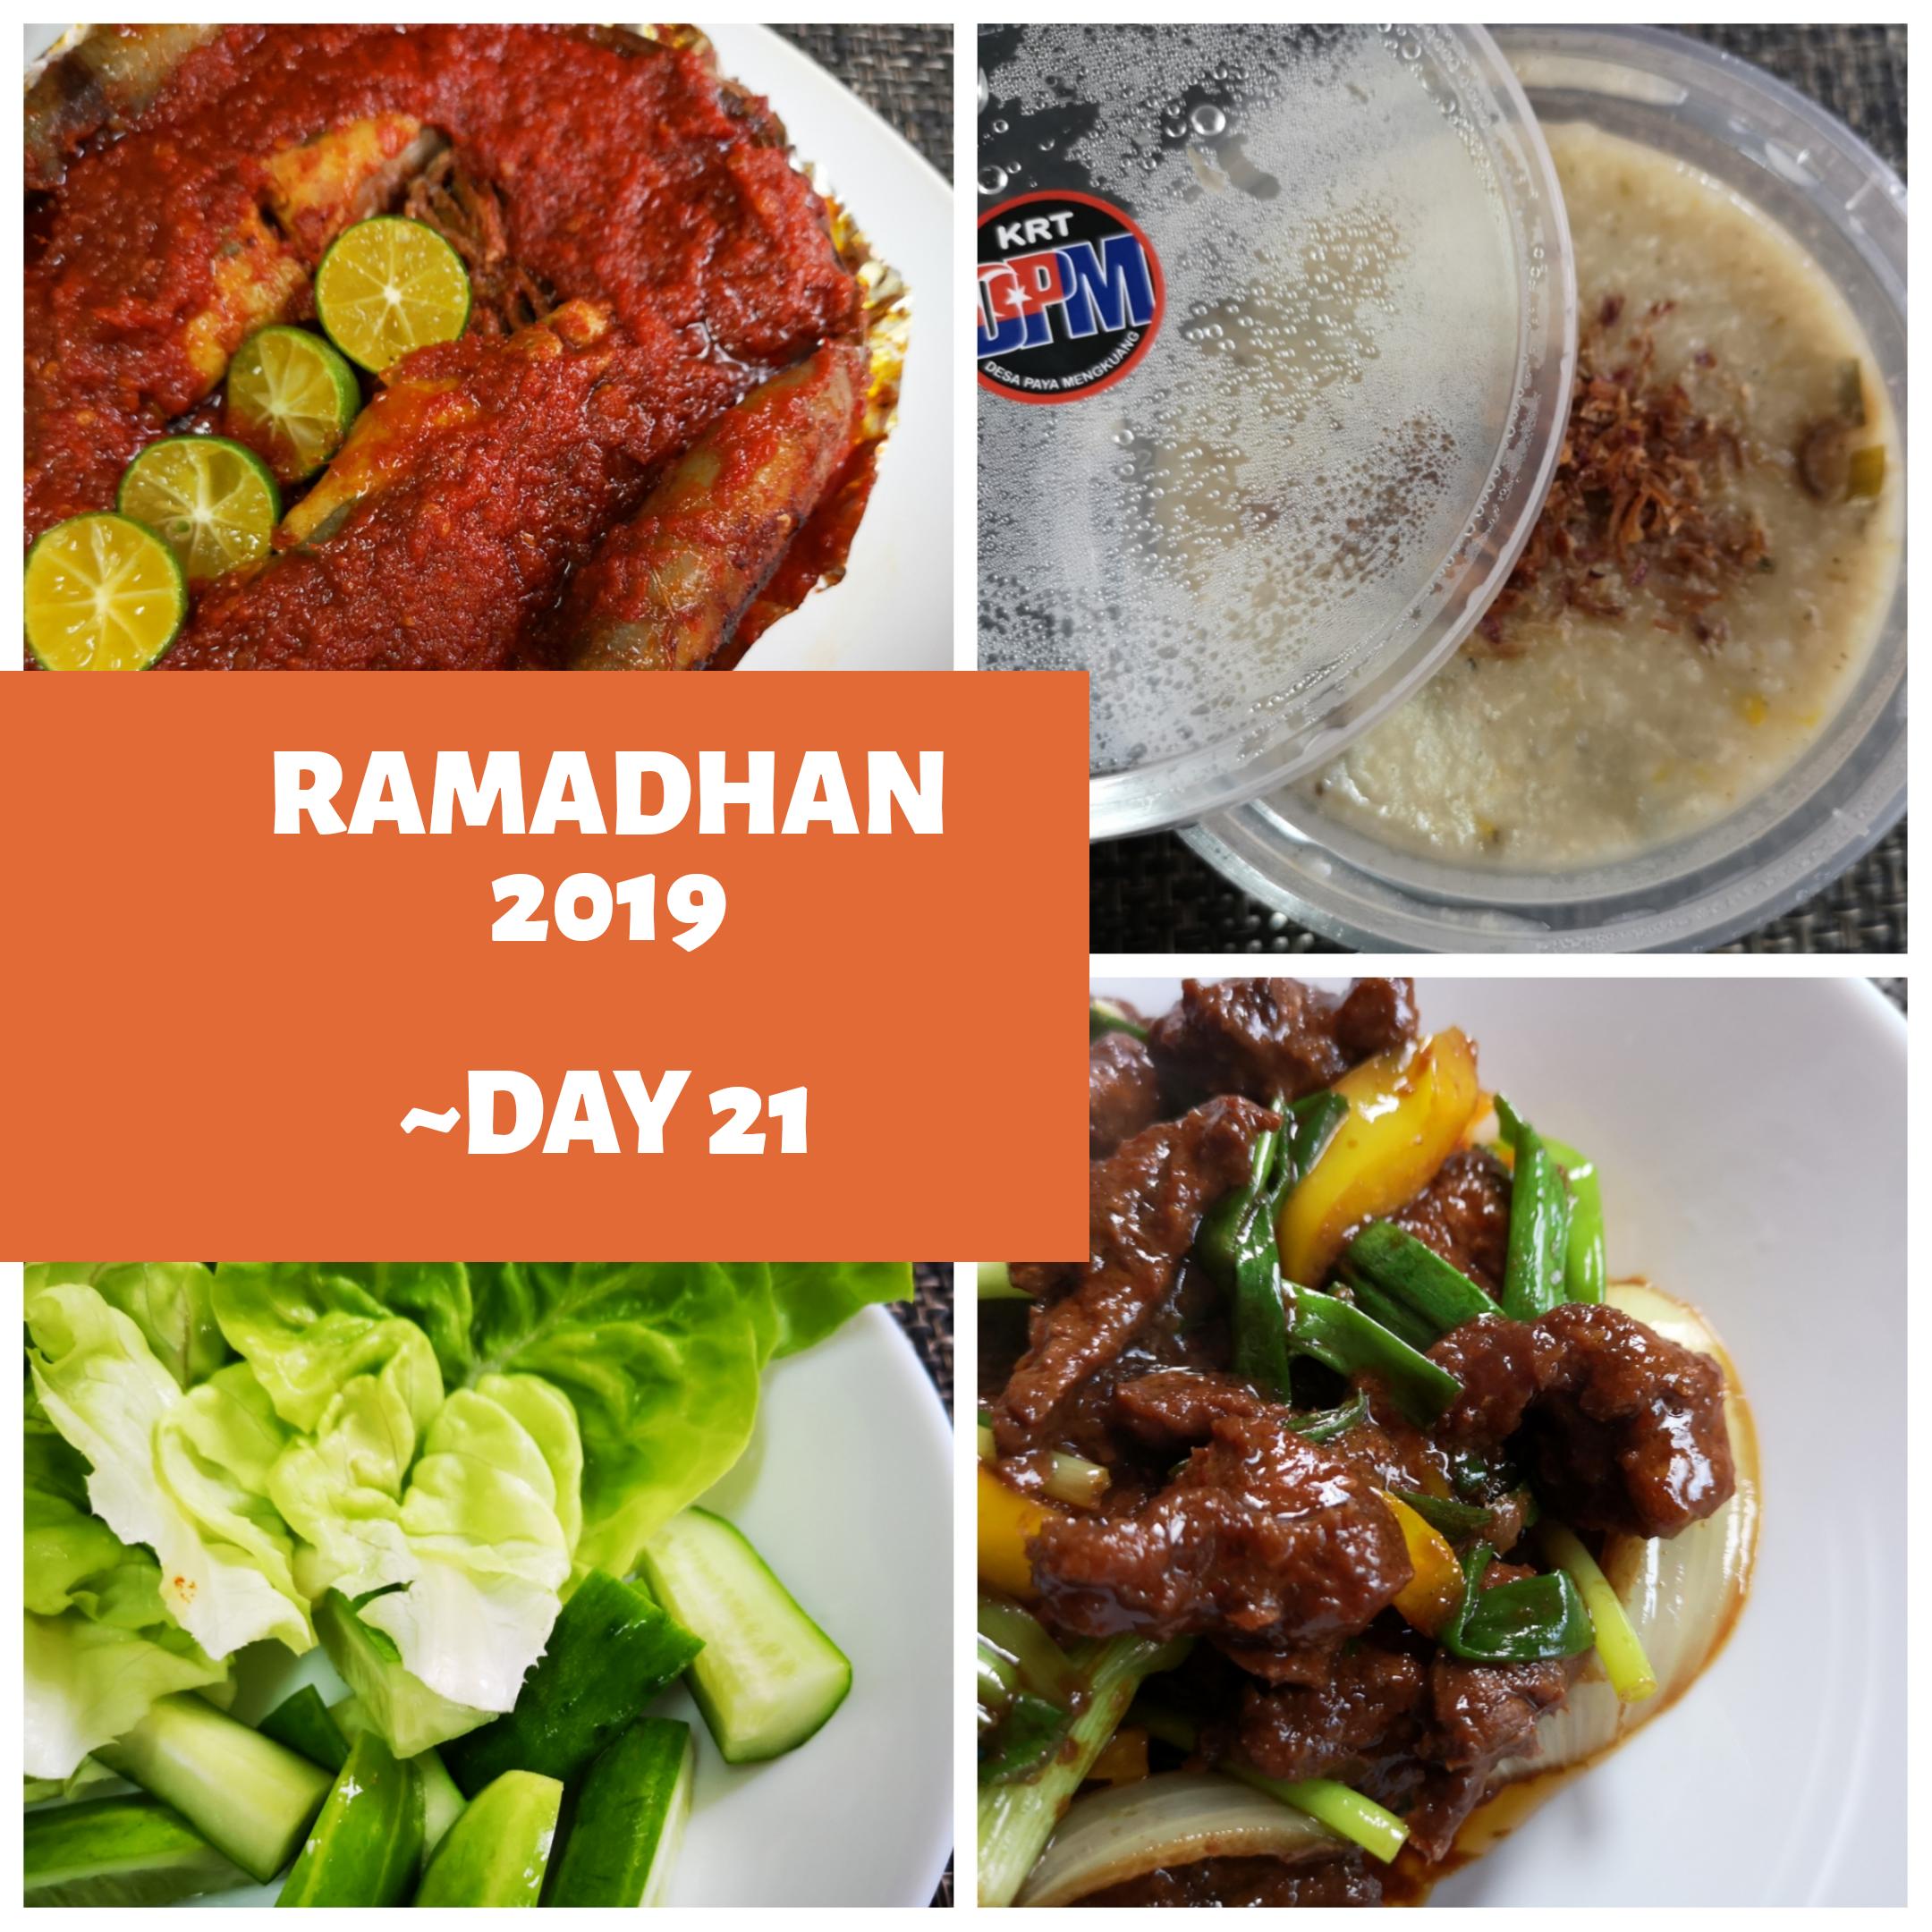 Ramadhan 2019 – Day 21